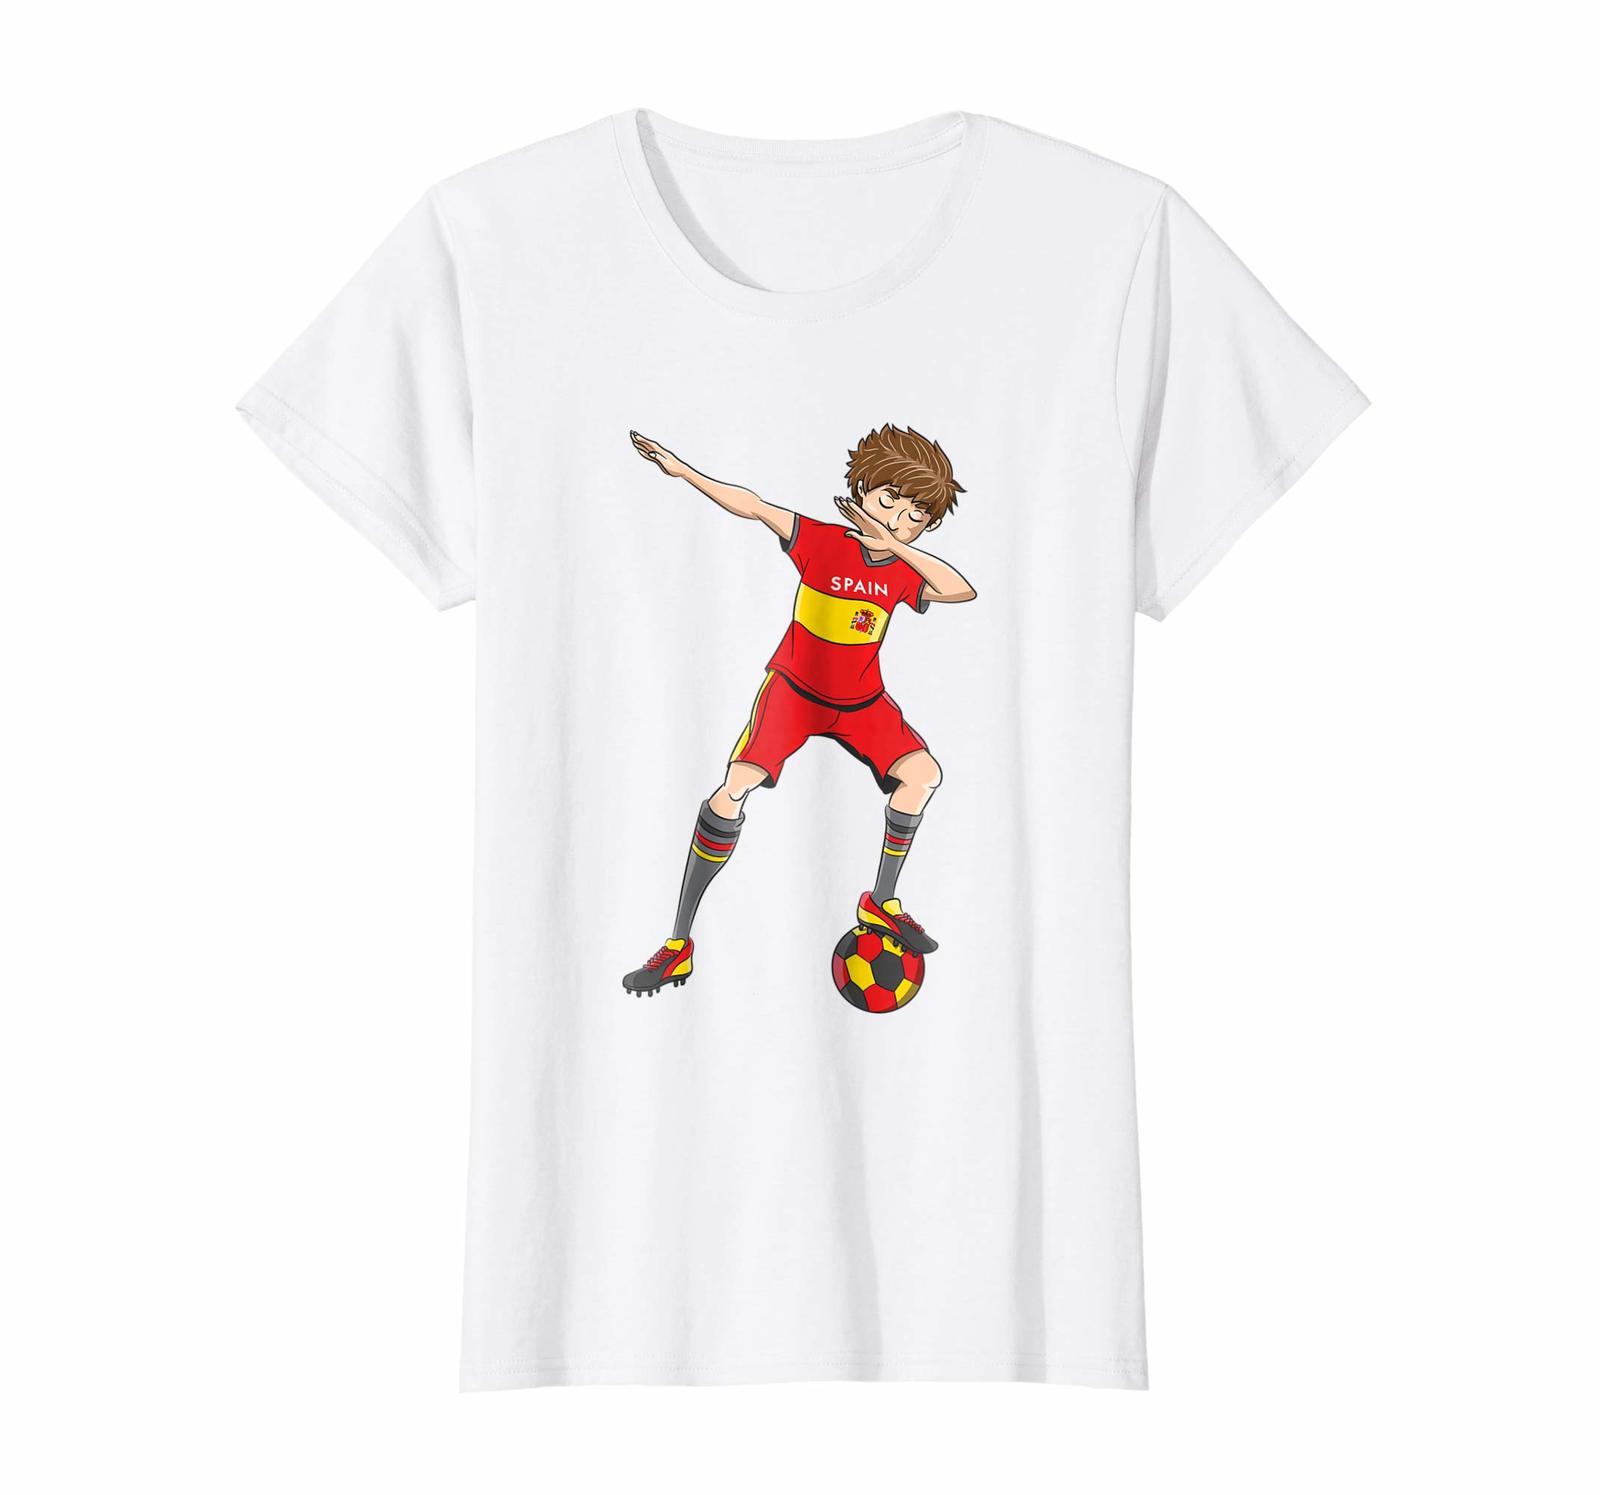 5a3f02cc8b6 Sport Shirts - Dabbing Soccer Boy Spain and 50 similar items. A1zdawwgrcl.  cla 7c2140 2000 7c81dr1m19uol.png 7c0 0 2140 2000 0.0 0.0 2140.0 2000.0